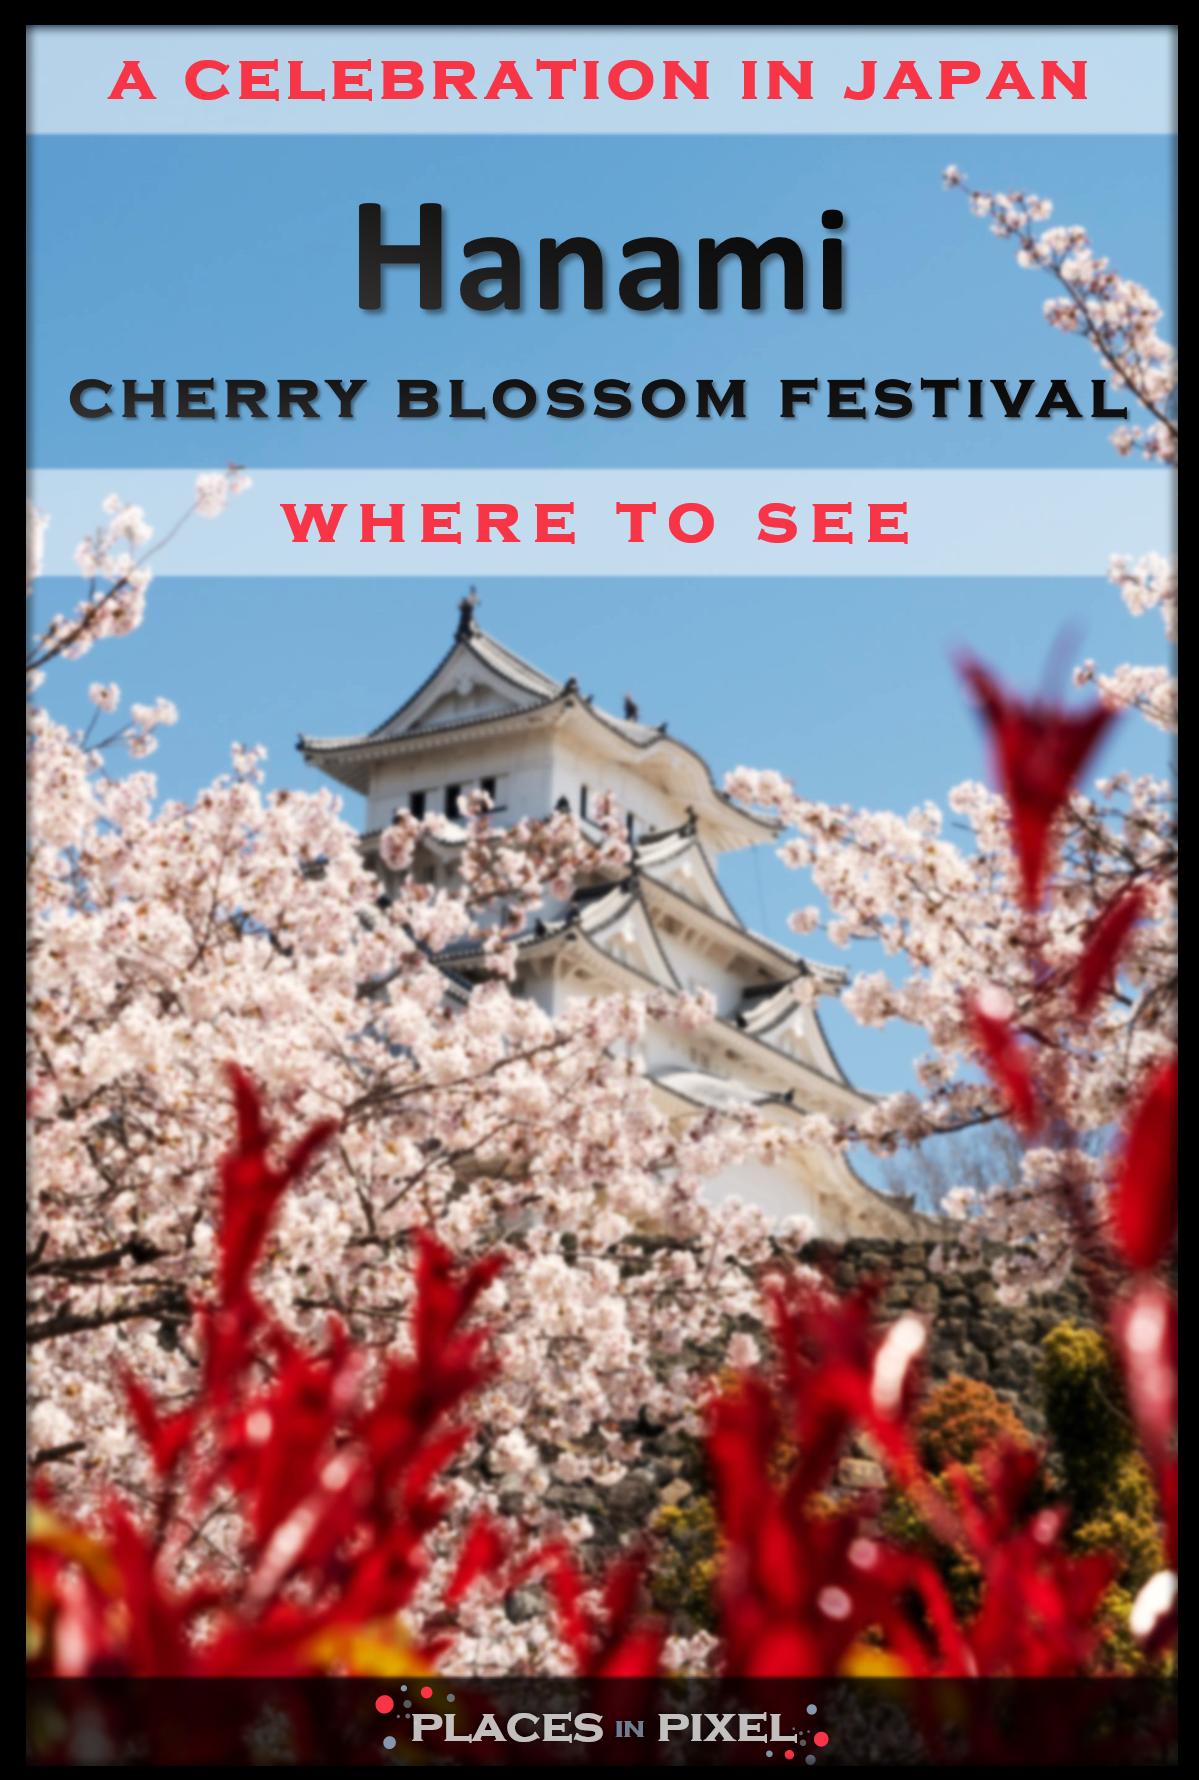 Hanami Cherry Blossom Festival In Japan Japan Cherry Blossom Festival Cherry Blossom Festival Cherry Blossom Japan